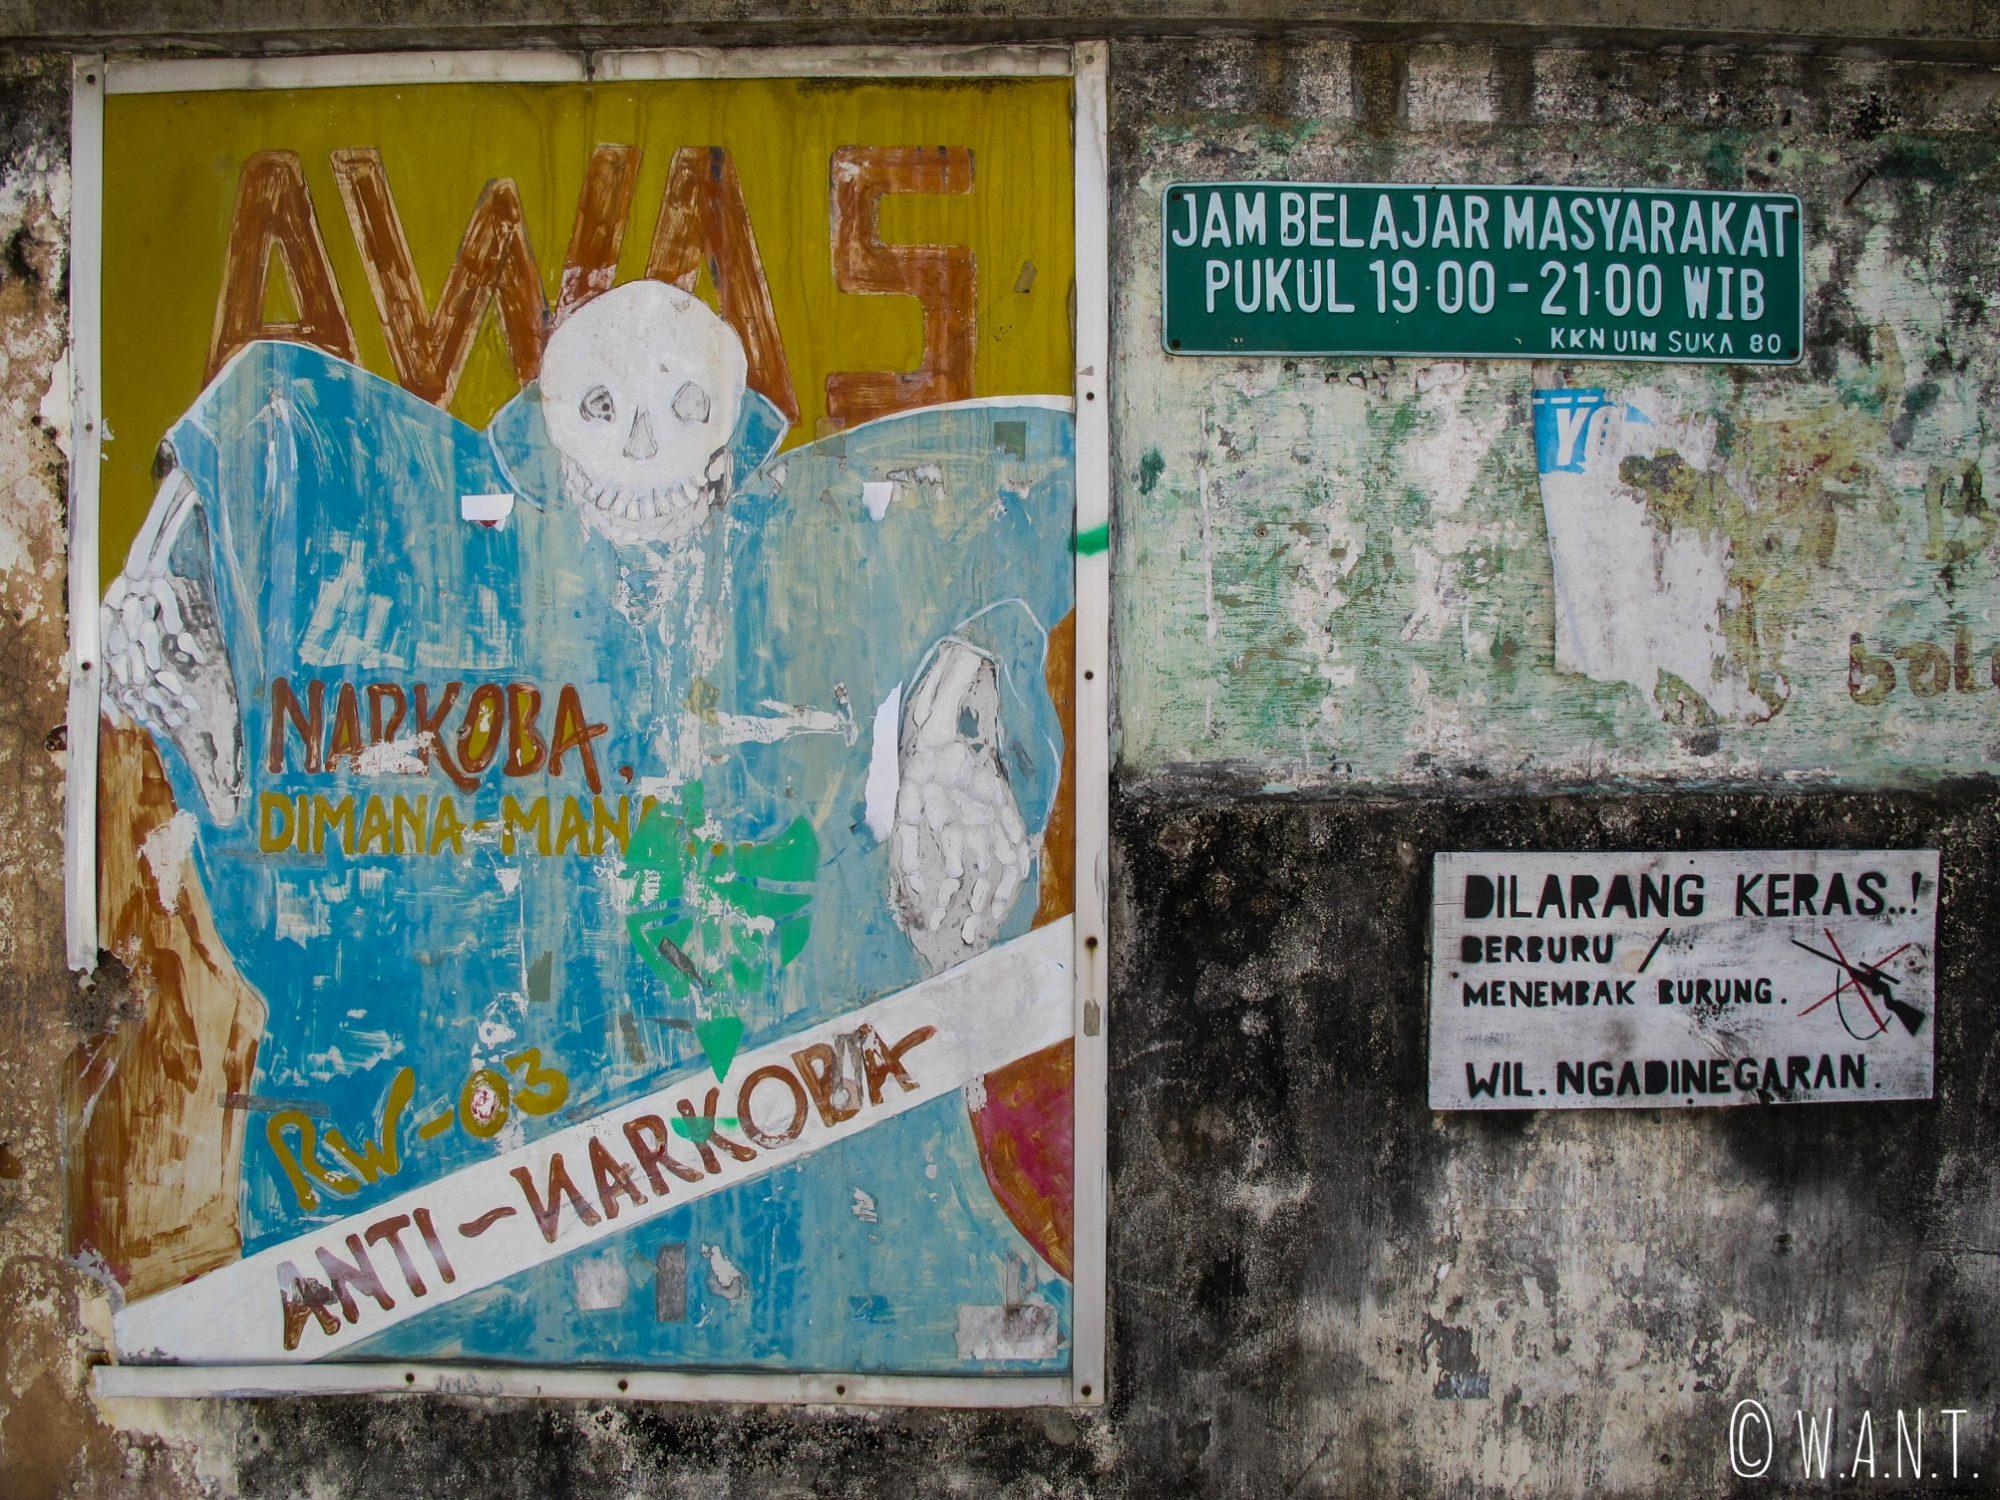 Affiche dans les rues de Yogyakarta